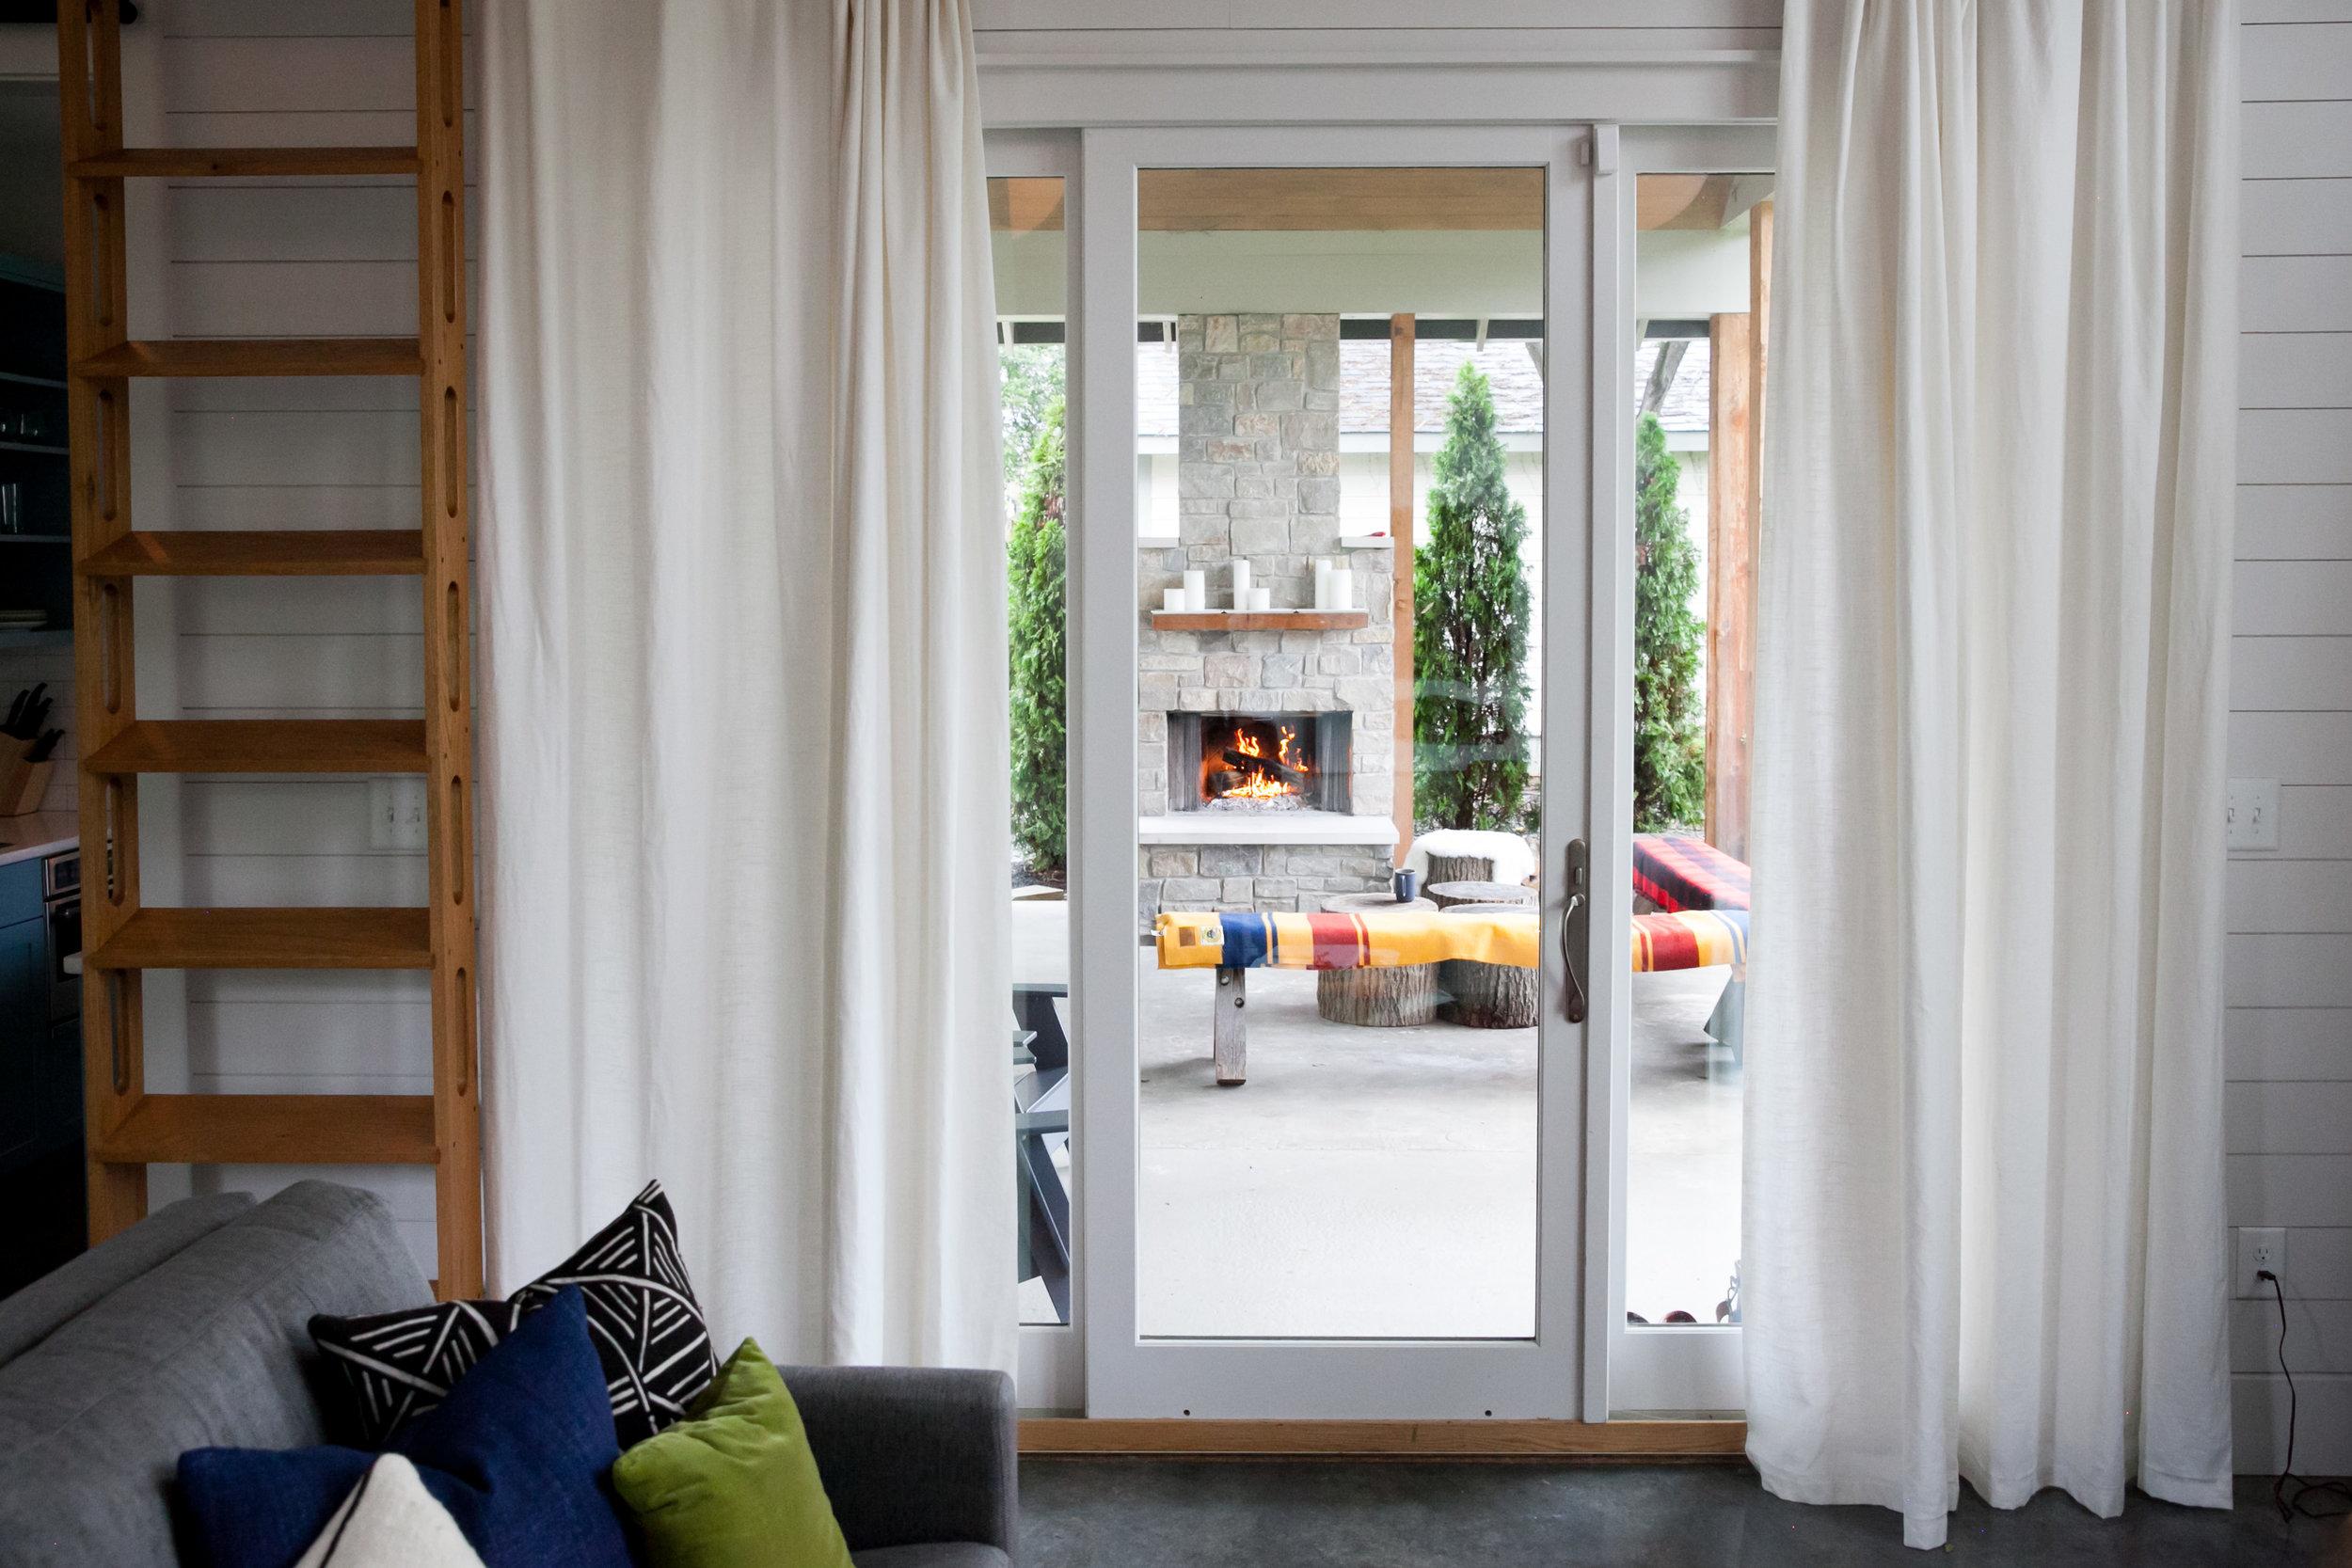 LisaDiederichPhotography_MattHomeTour_ApartmentTherapy-5.jpg